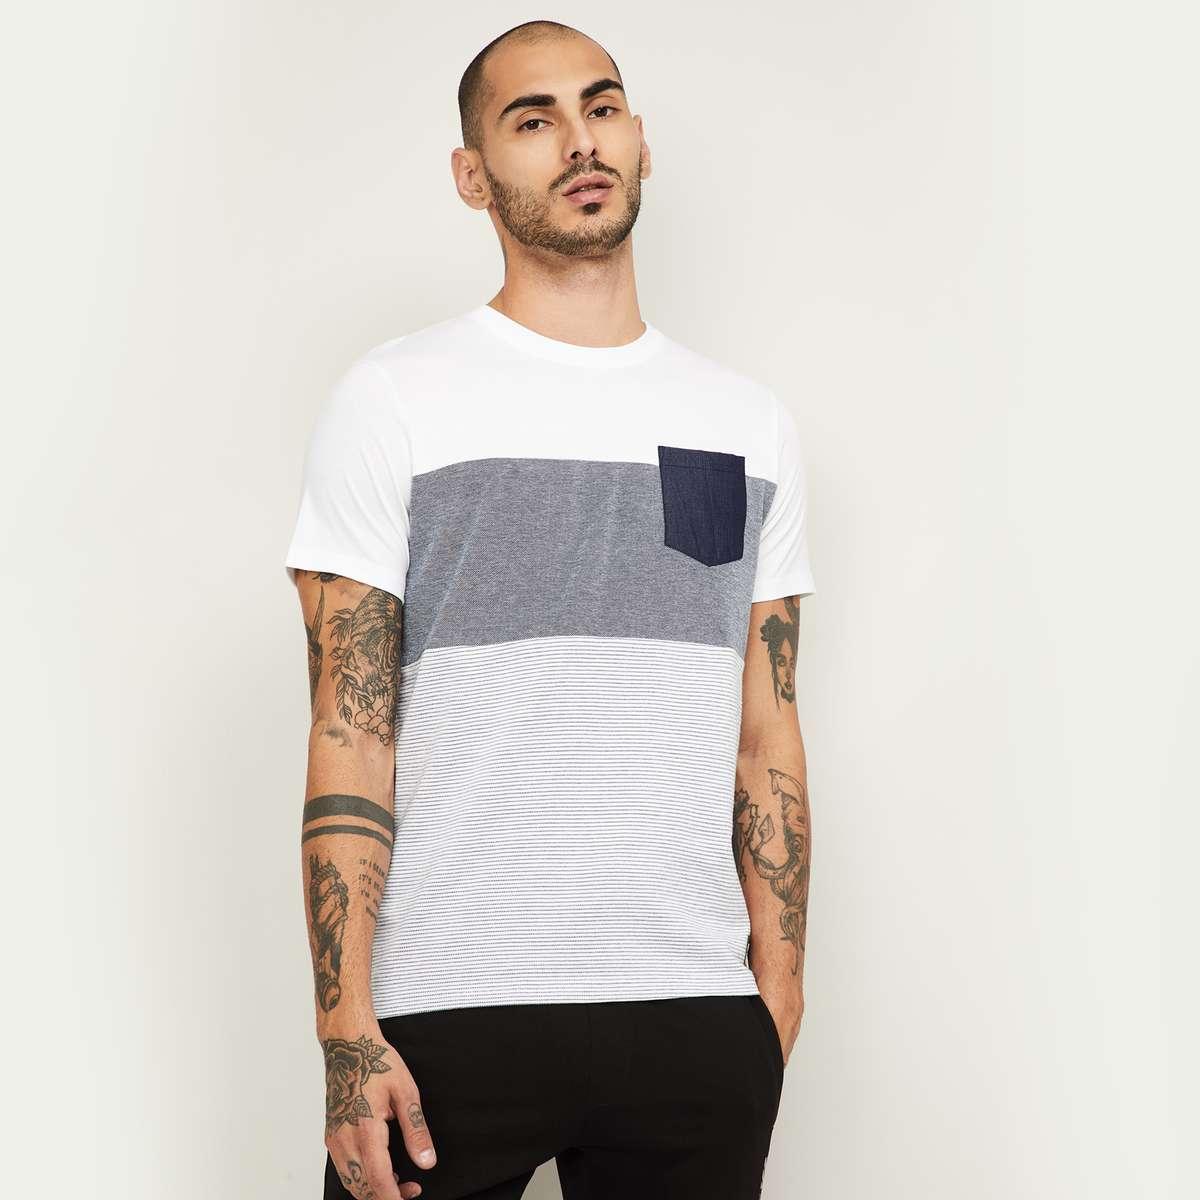 4.BOSSINI Men Colourblocked Regular Fit Crew Neck T-shirt